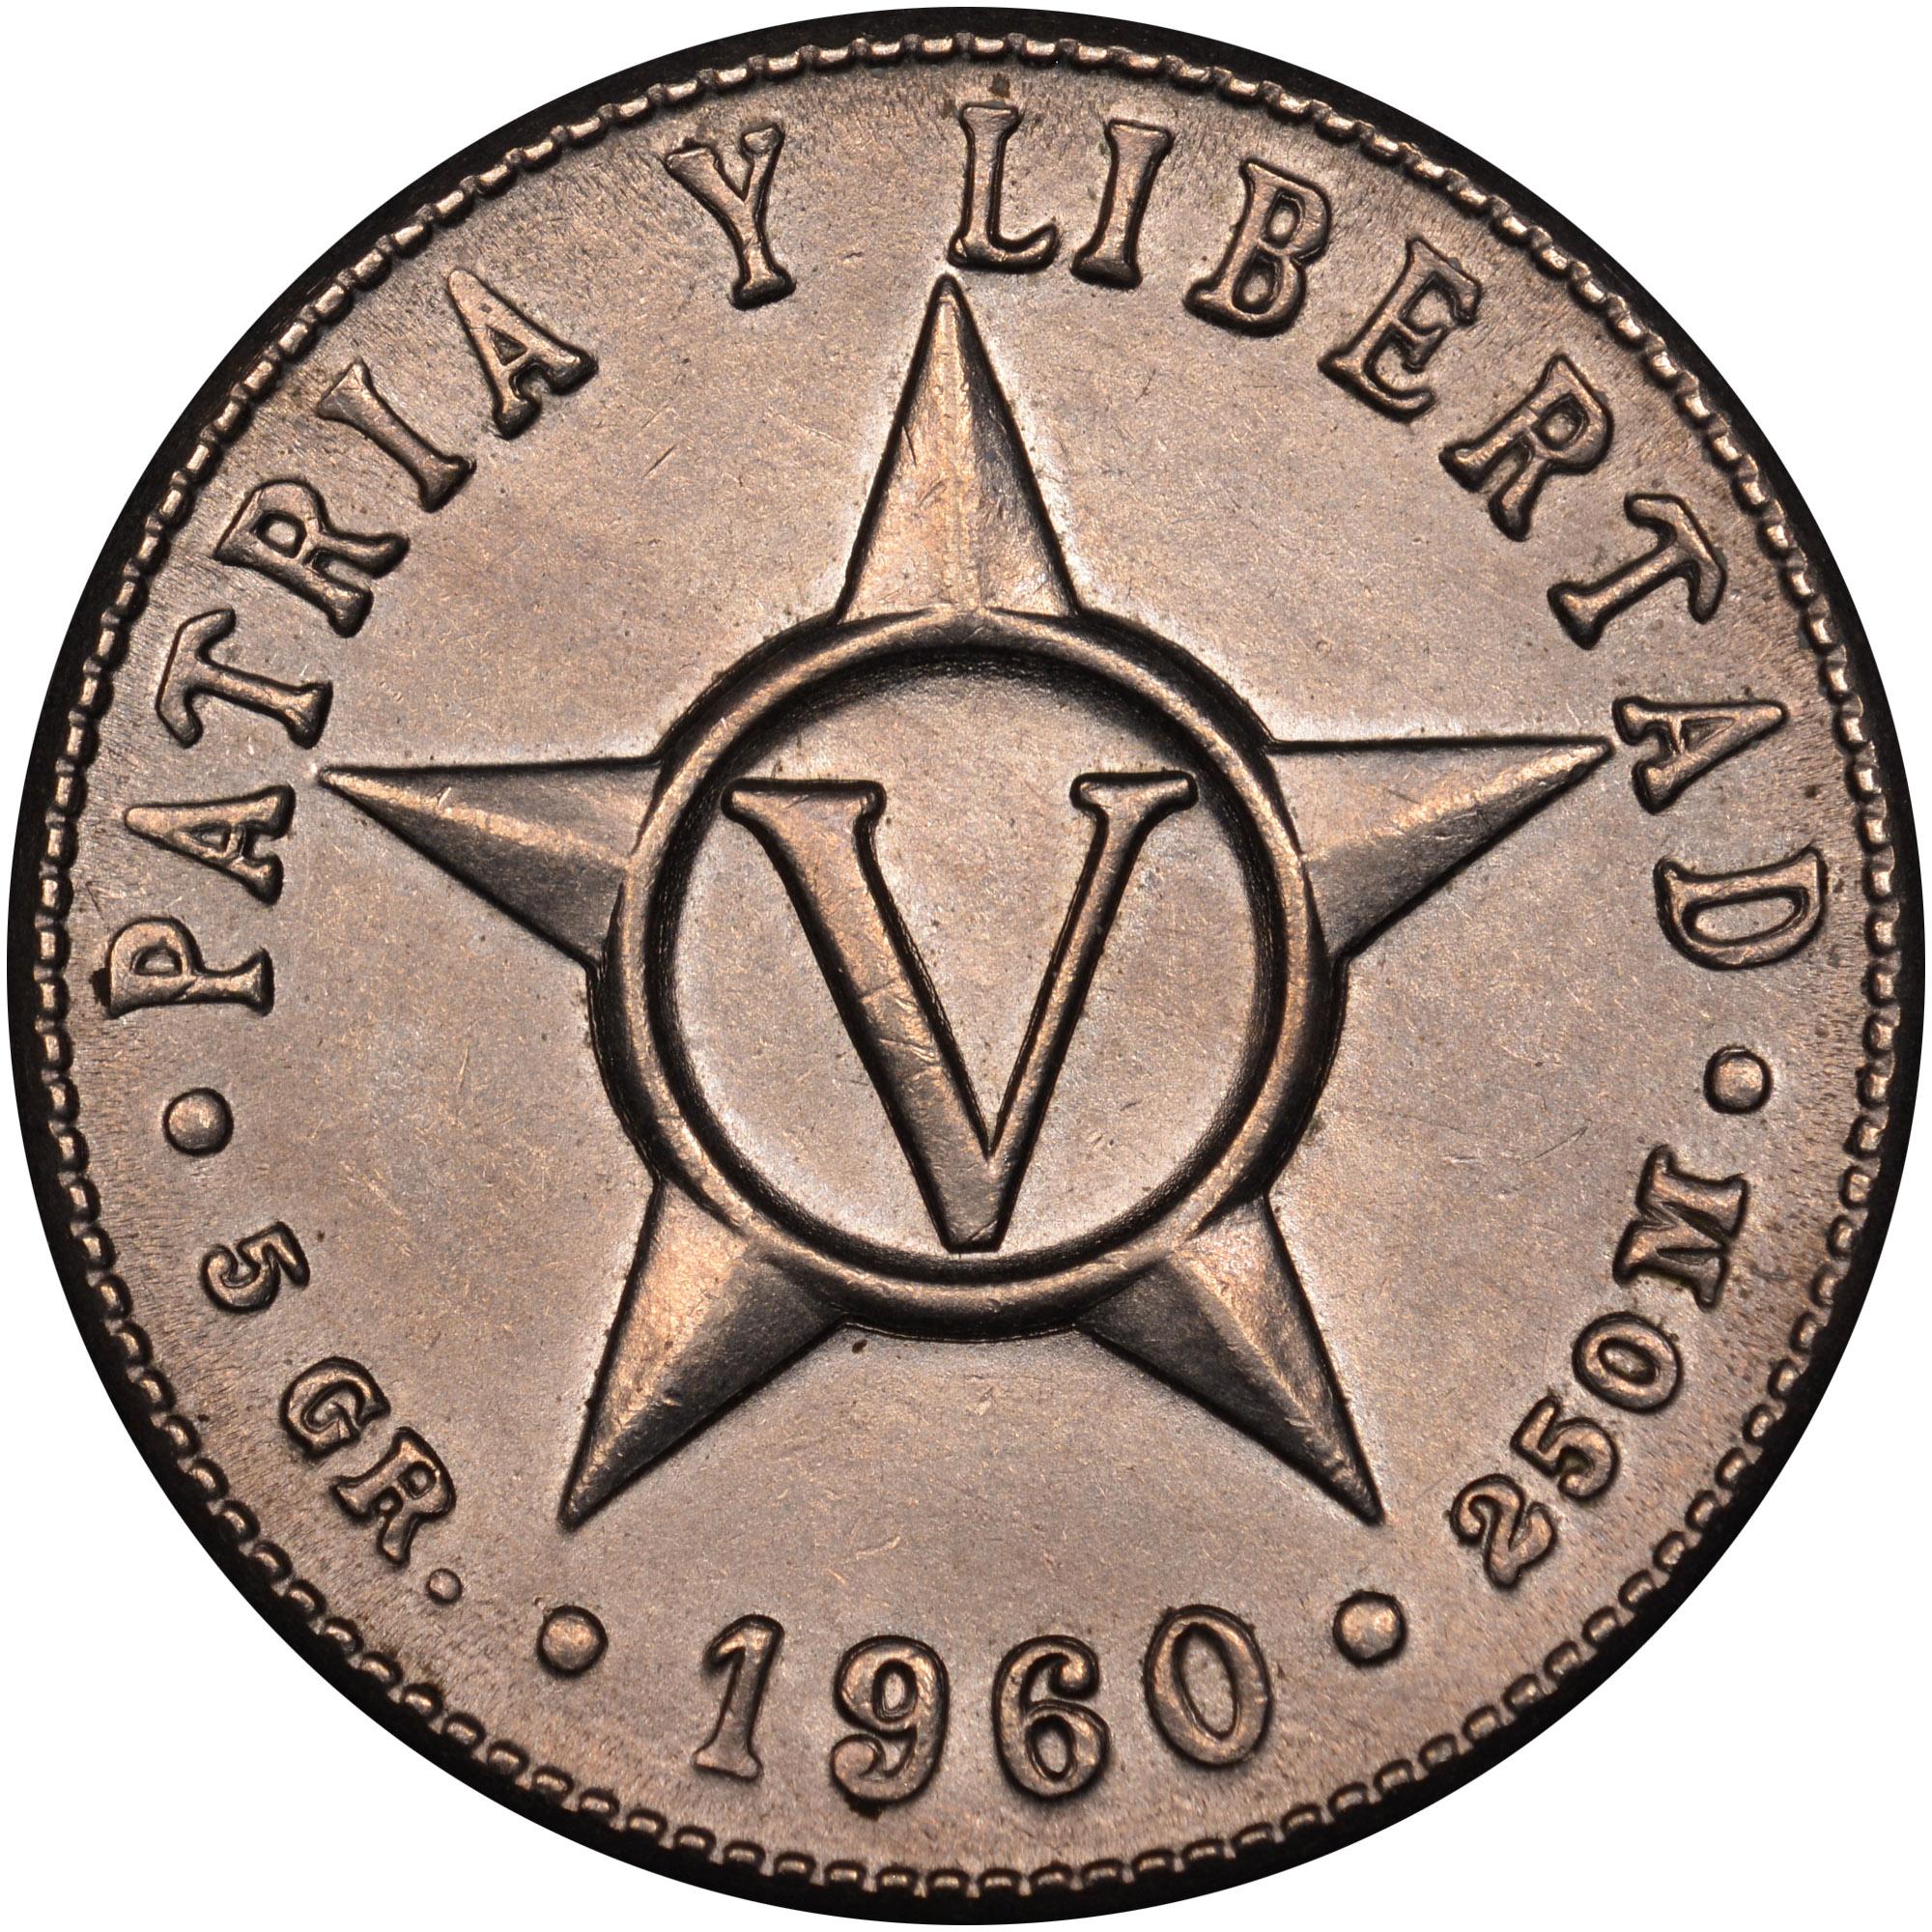 1946-1961 Cuba 5 Centavos reverse